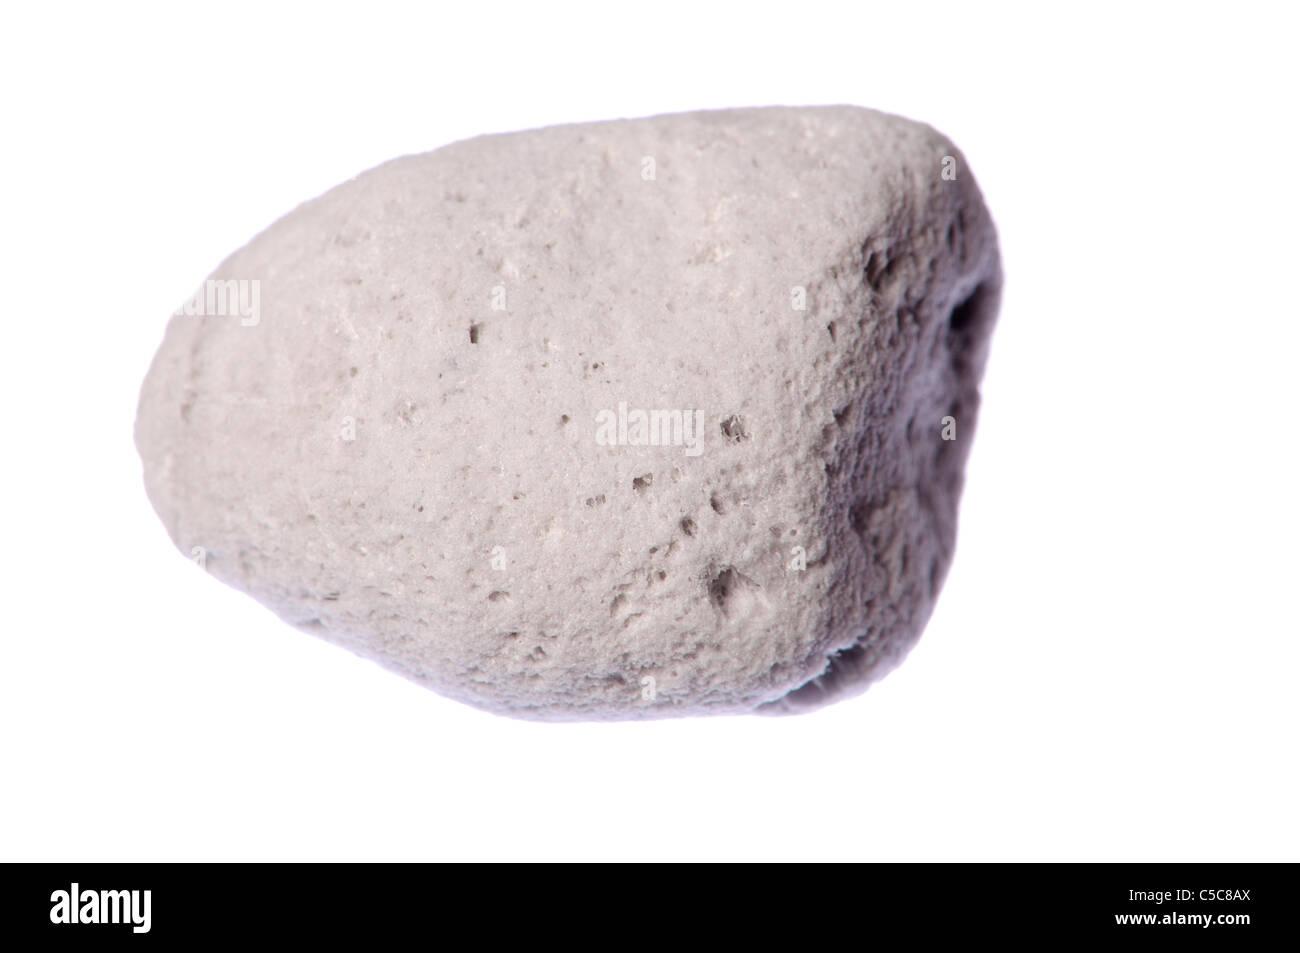 Pumice (Turkey) Porous volcanic glass - Stock Image